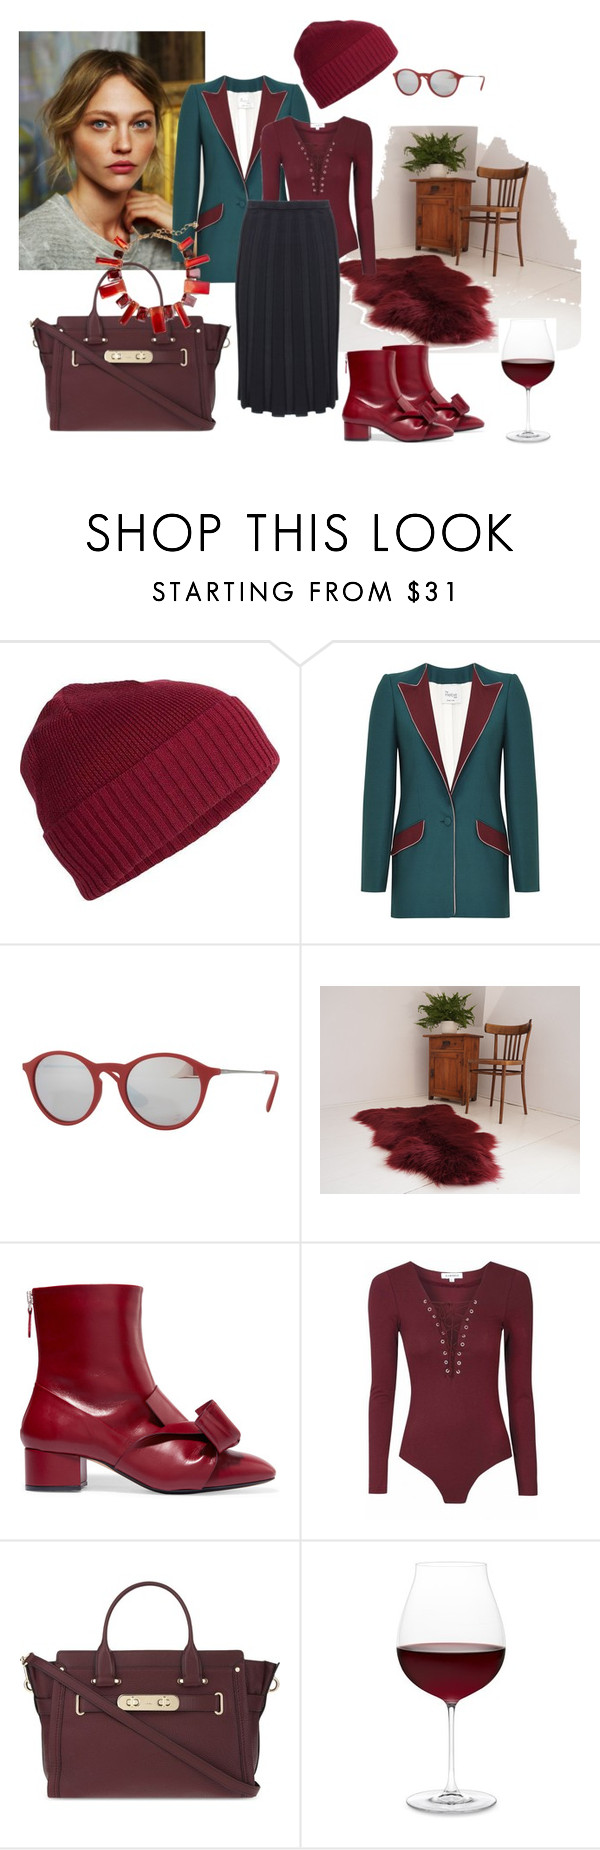 """Autumn style #2"" by lailamur on Polyvore featuring мода, Icebreaker, Hebe Studio, Ray-Ban, N°21, Coach, Riedel и Oscar de la Renta"